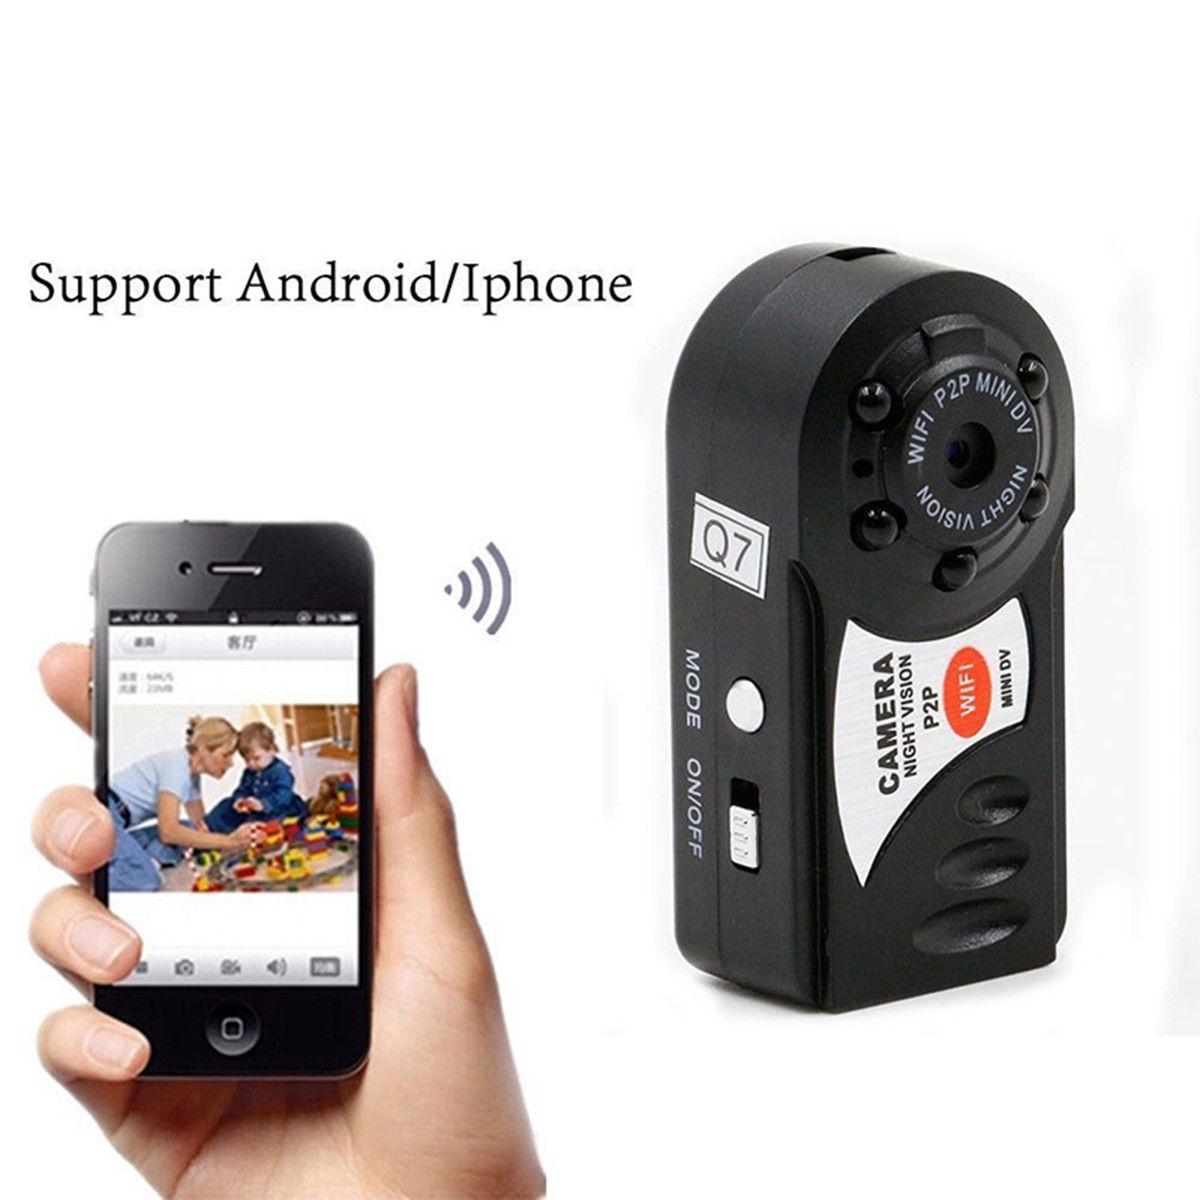 4G Card+Mini Q7 WIFI Night Vision Wireless Camera P2P DVR Surveillance Video Record Cam4G Card+Mini Q7 WIFI Night Vision Wireless Camera P2P DVR Surveillance Video Record Cam